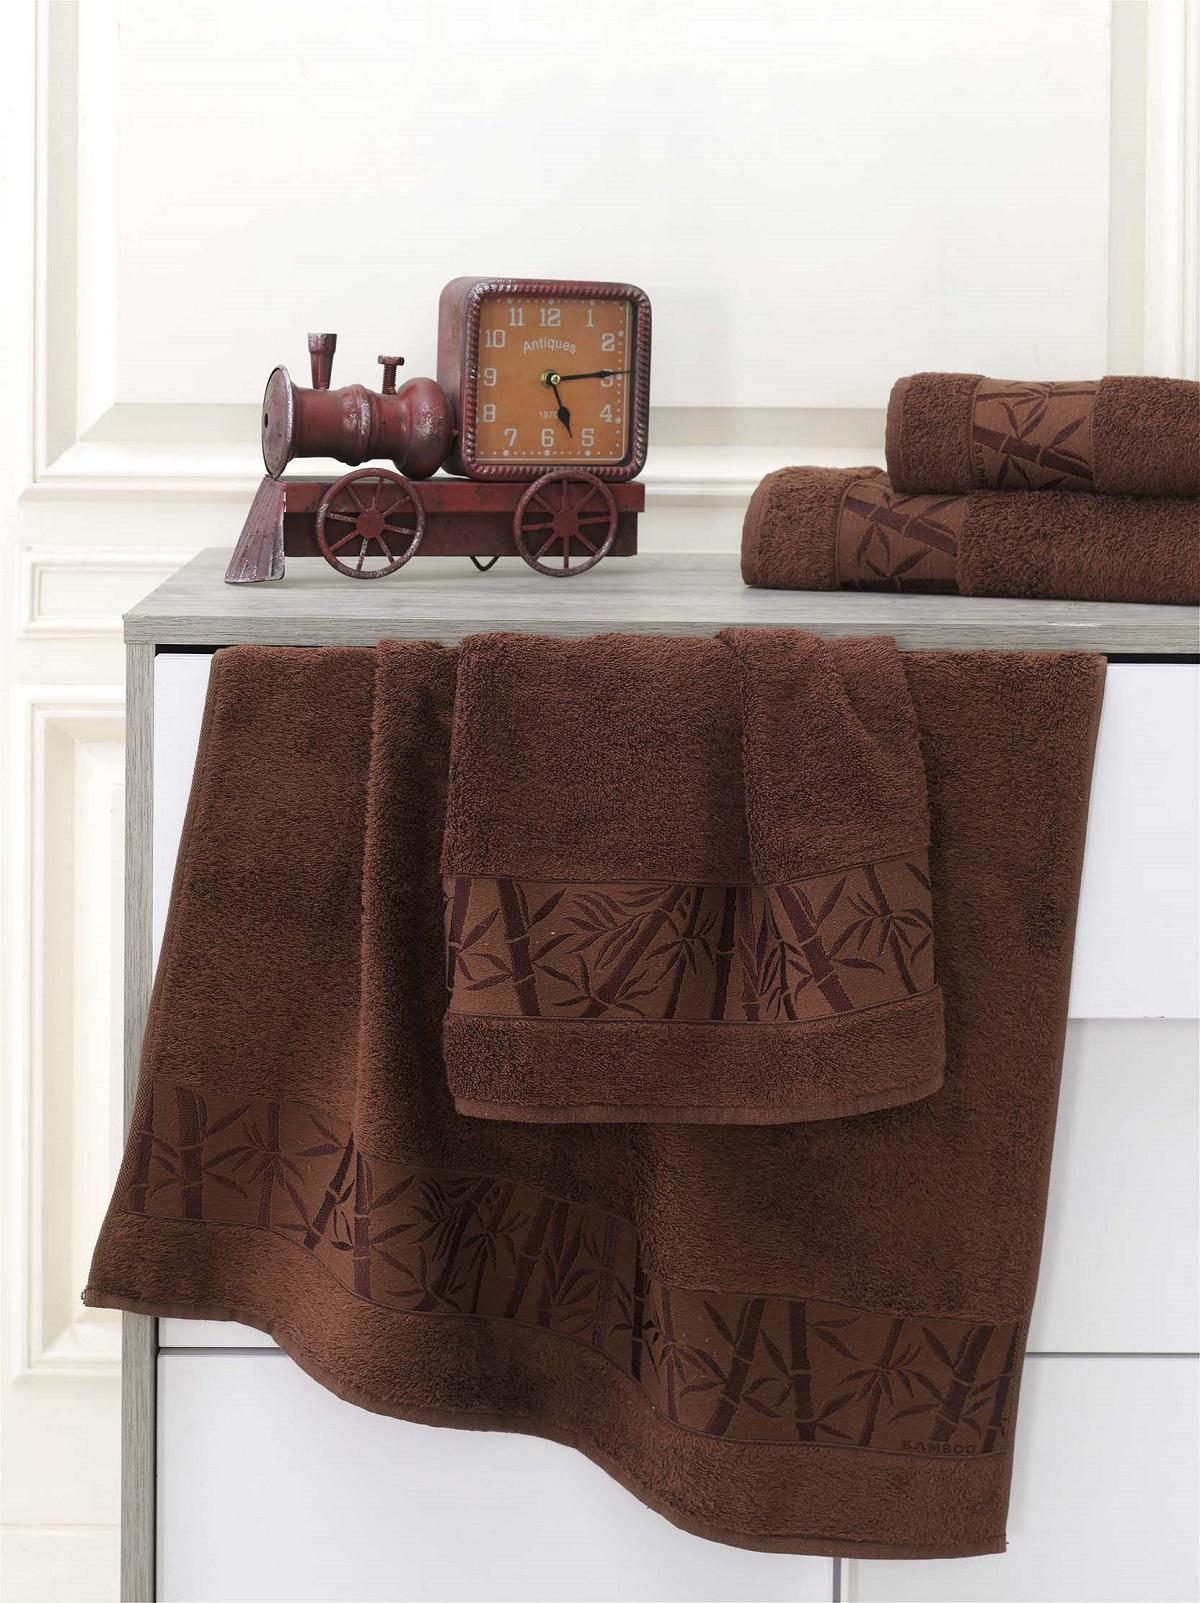 Полотенца Karna Полотенце Pamira Цвет: Коричневый (70х140 см) karna karna полотенце innes цвет красный 70х140 см